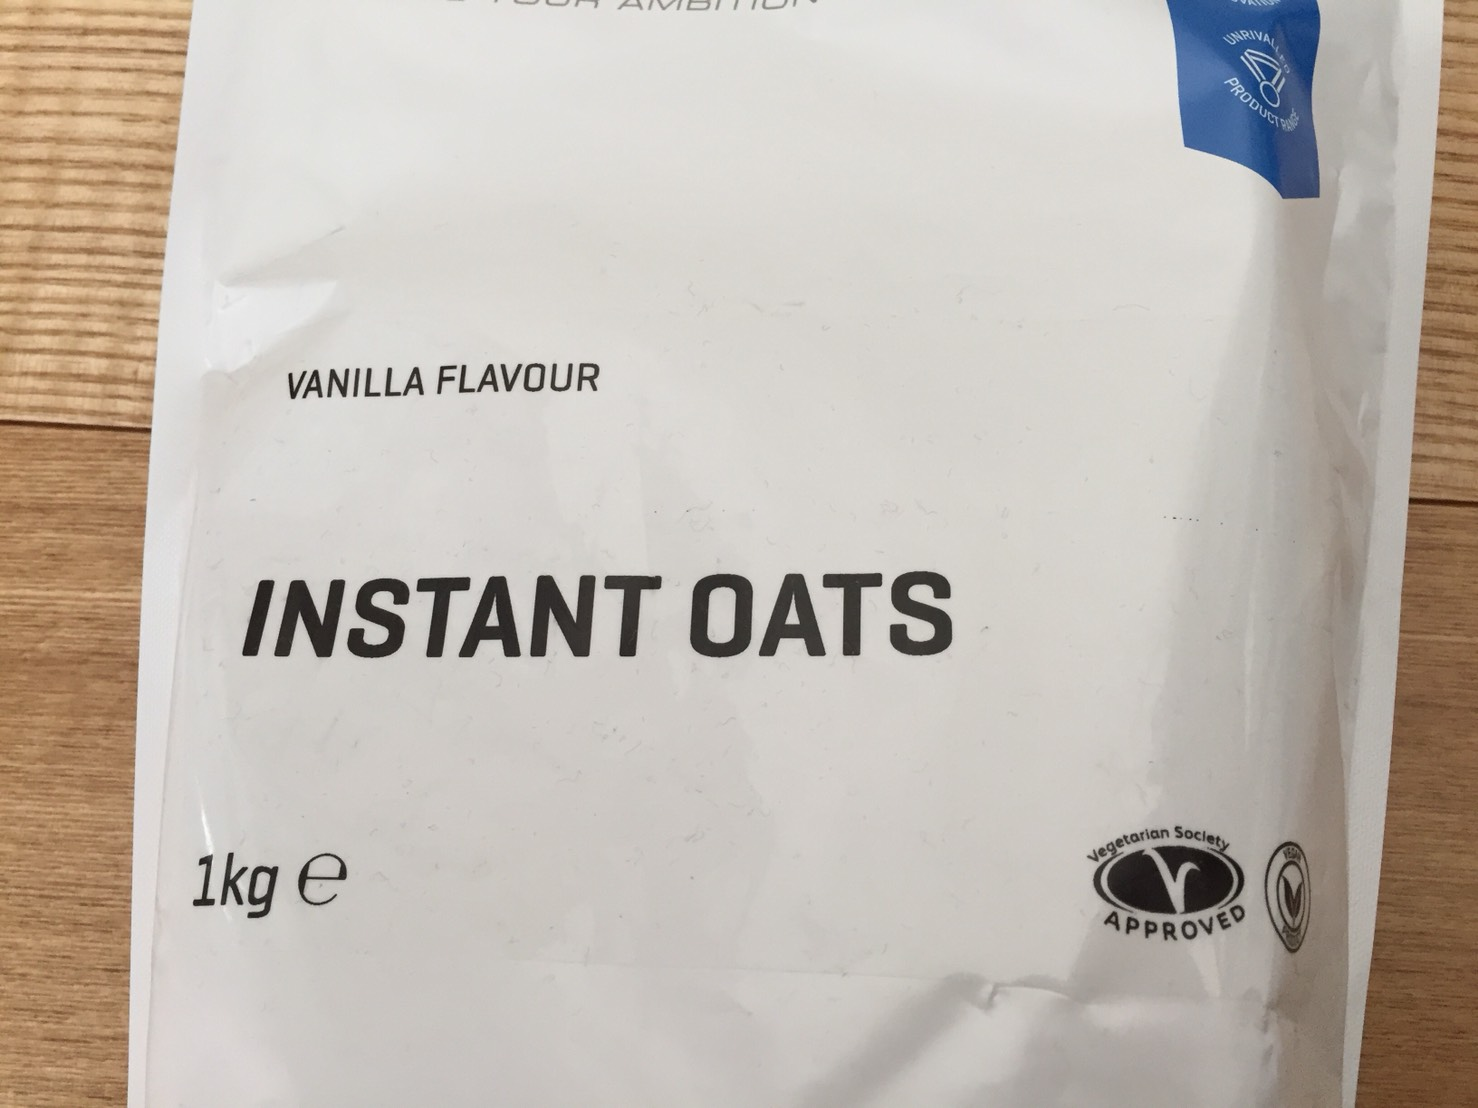 INSTANT OATS(インスタントオーツ)VANILLA FLAVOUR(バニラ味)の成分表